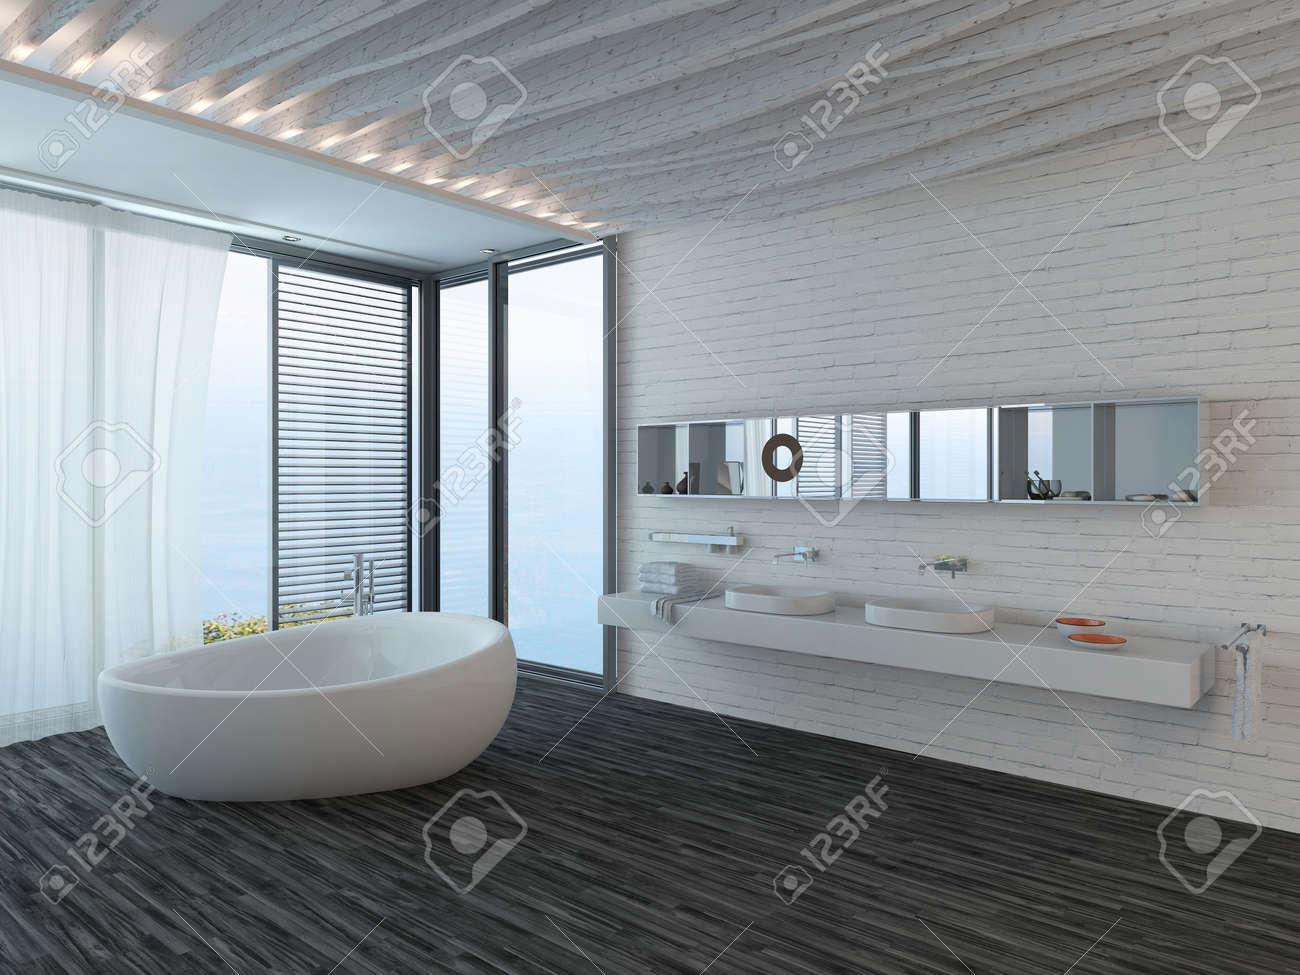 Pure White Bathroom Interior With Bathtub And Black Parquet Floor ...